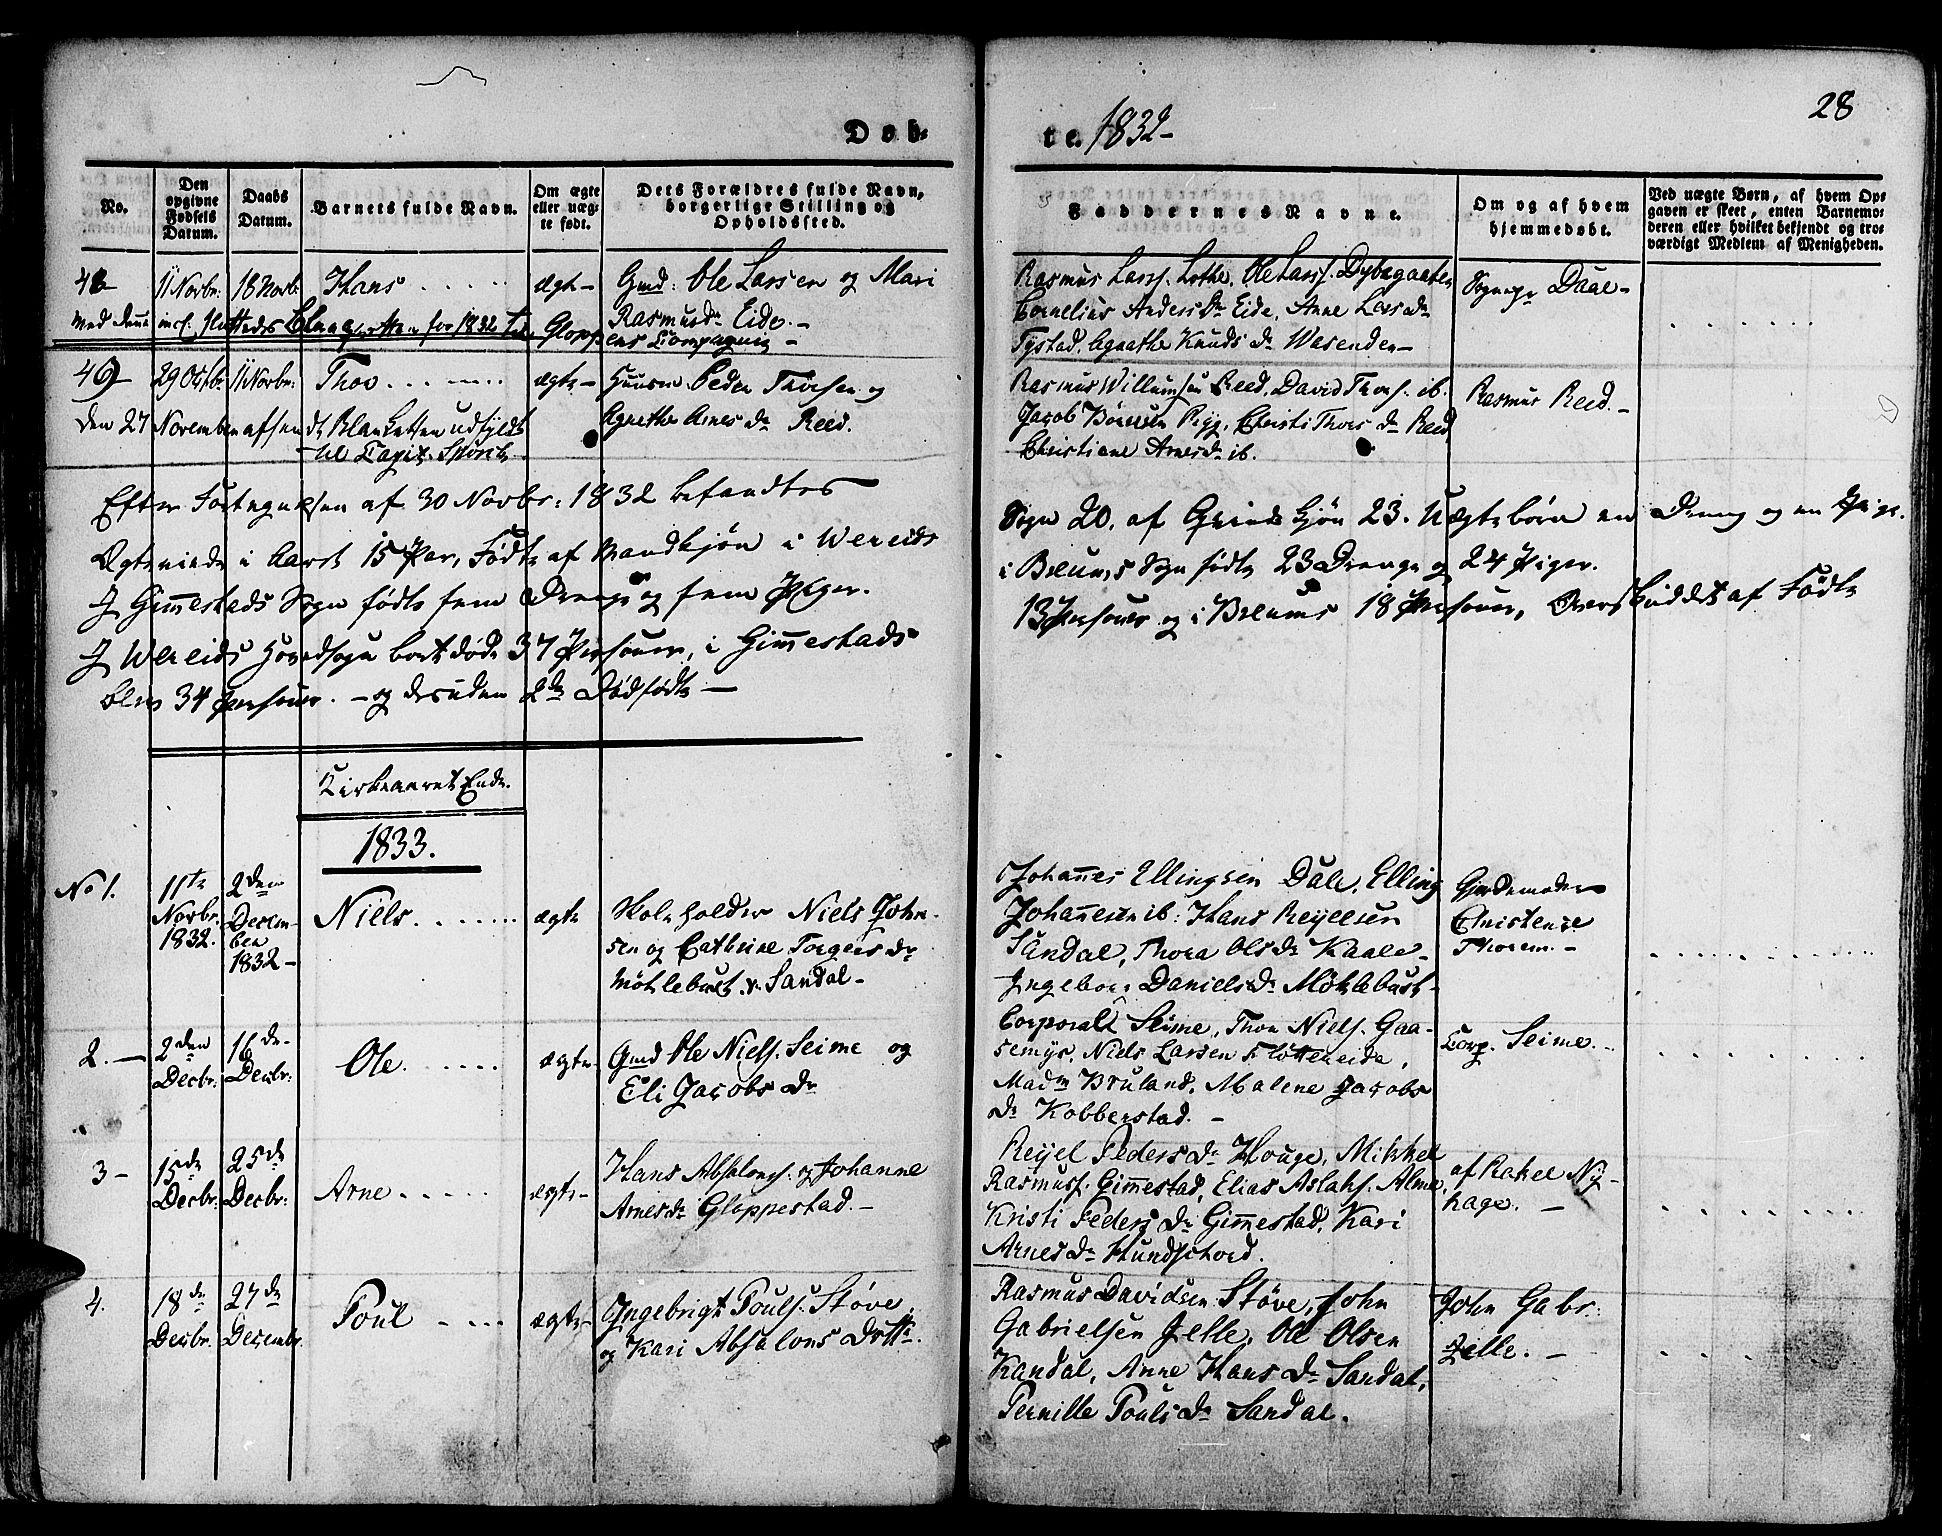 SAB, Gloppen Sokneprestembete, H/Haa/Haaa/L0007: Ministerialbok nr. A 7, 1827-1837, s. 28